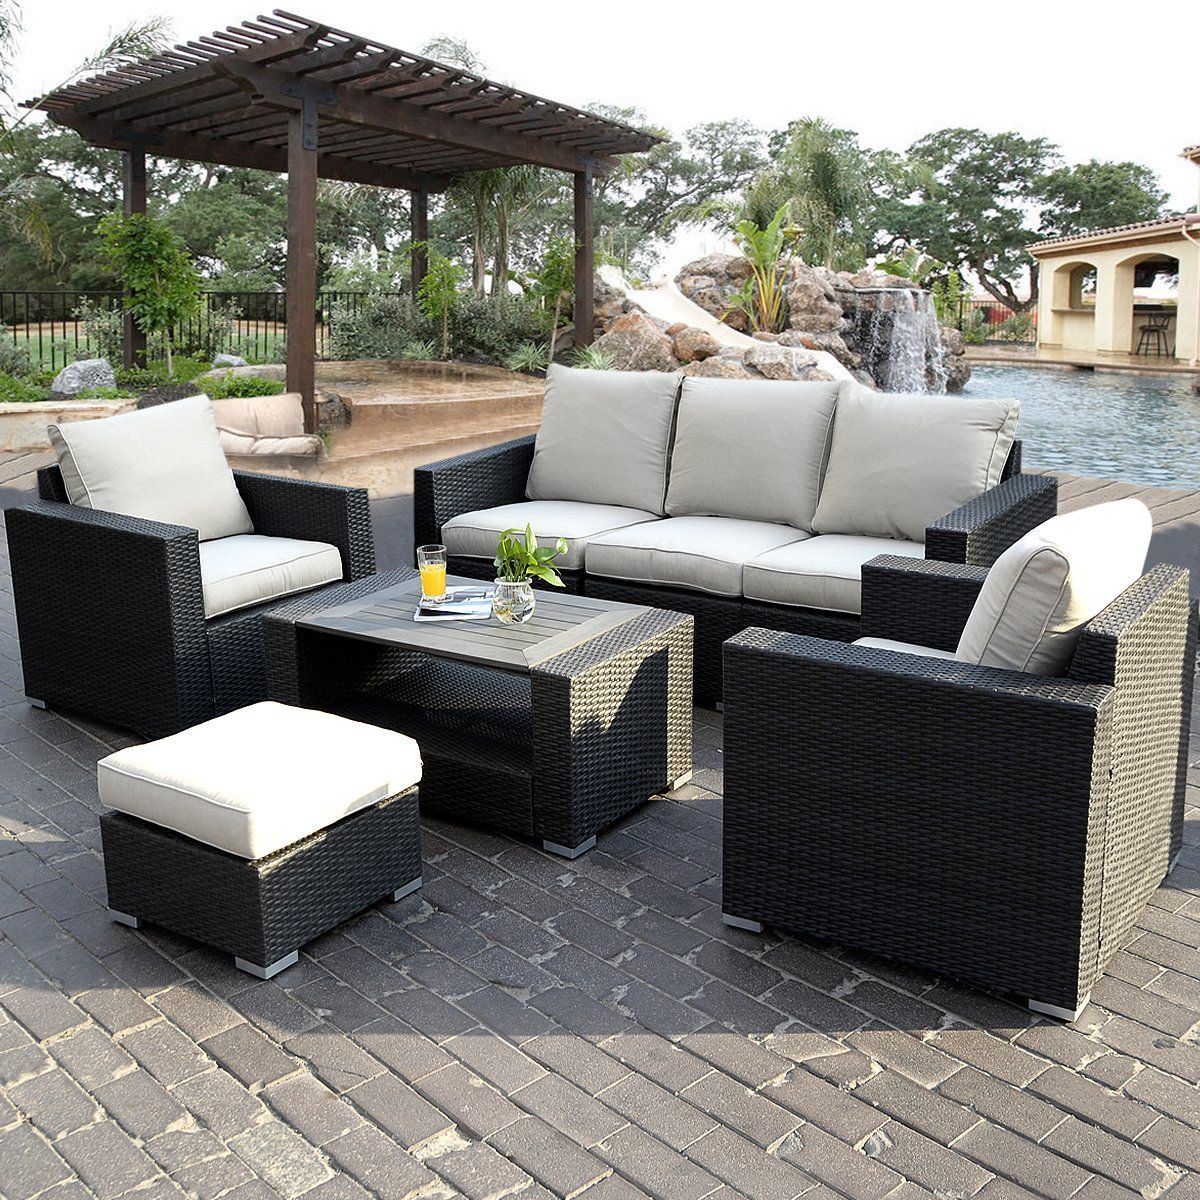 FDS 7PC Rattan Outdoor Garden Furniture Patio Corner Sofa